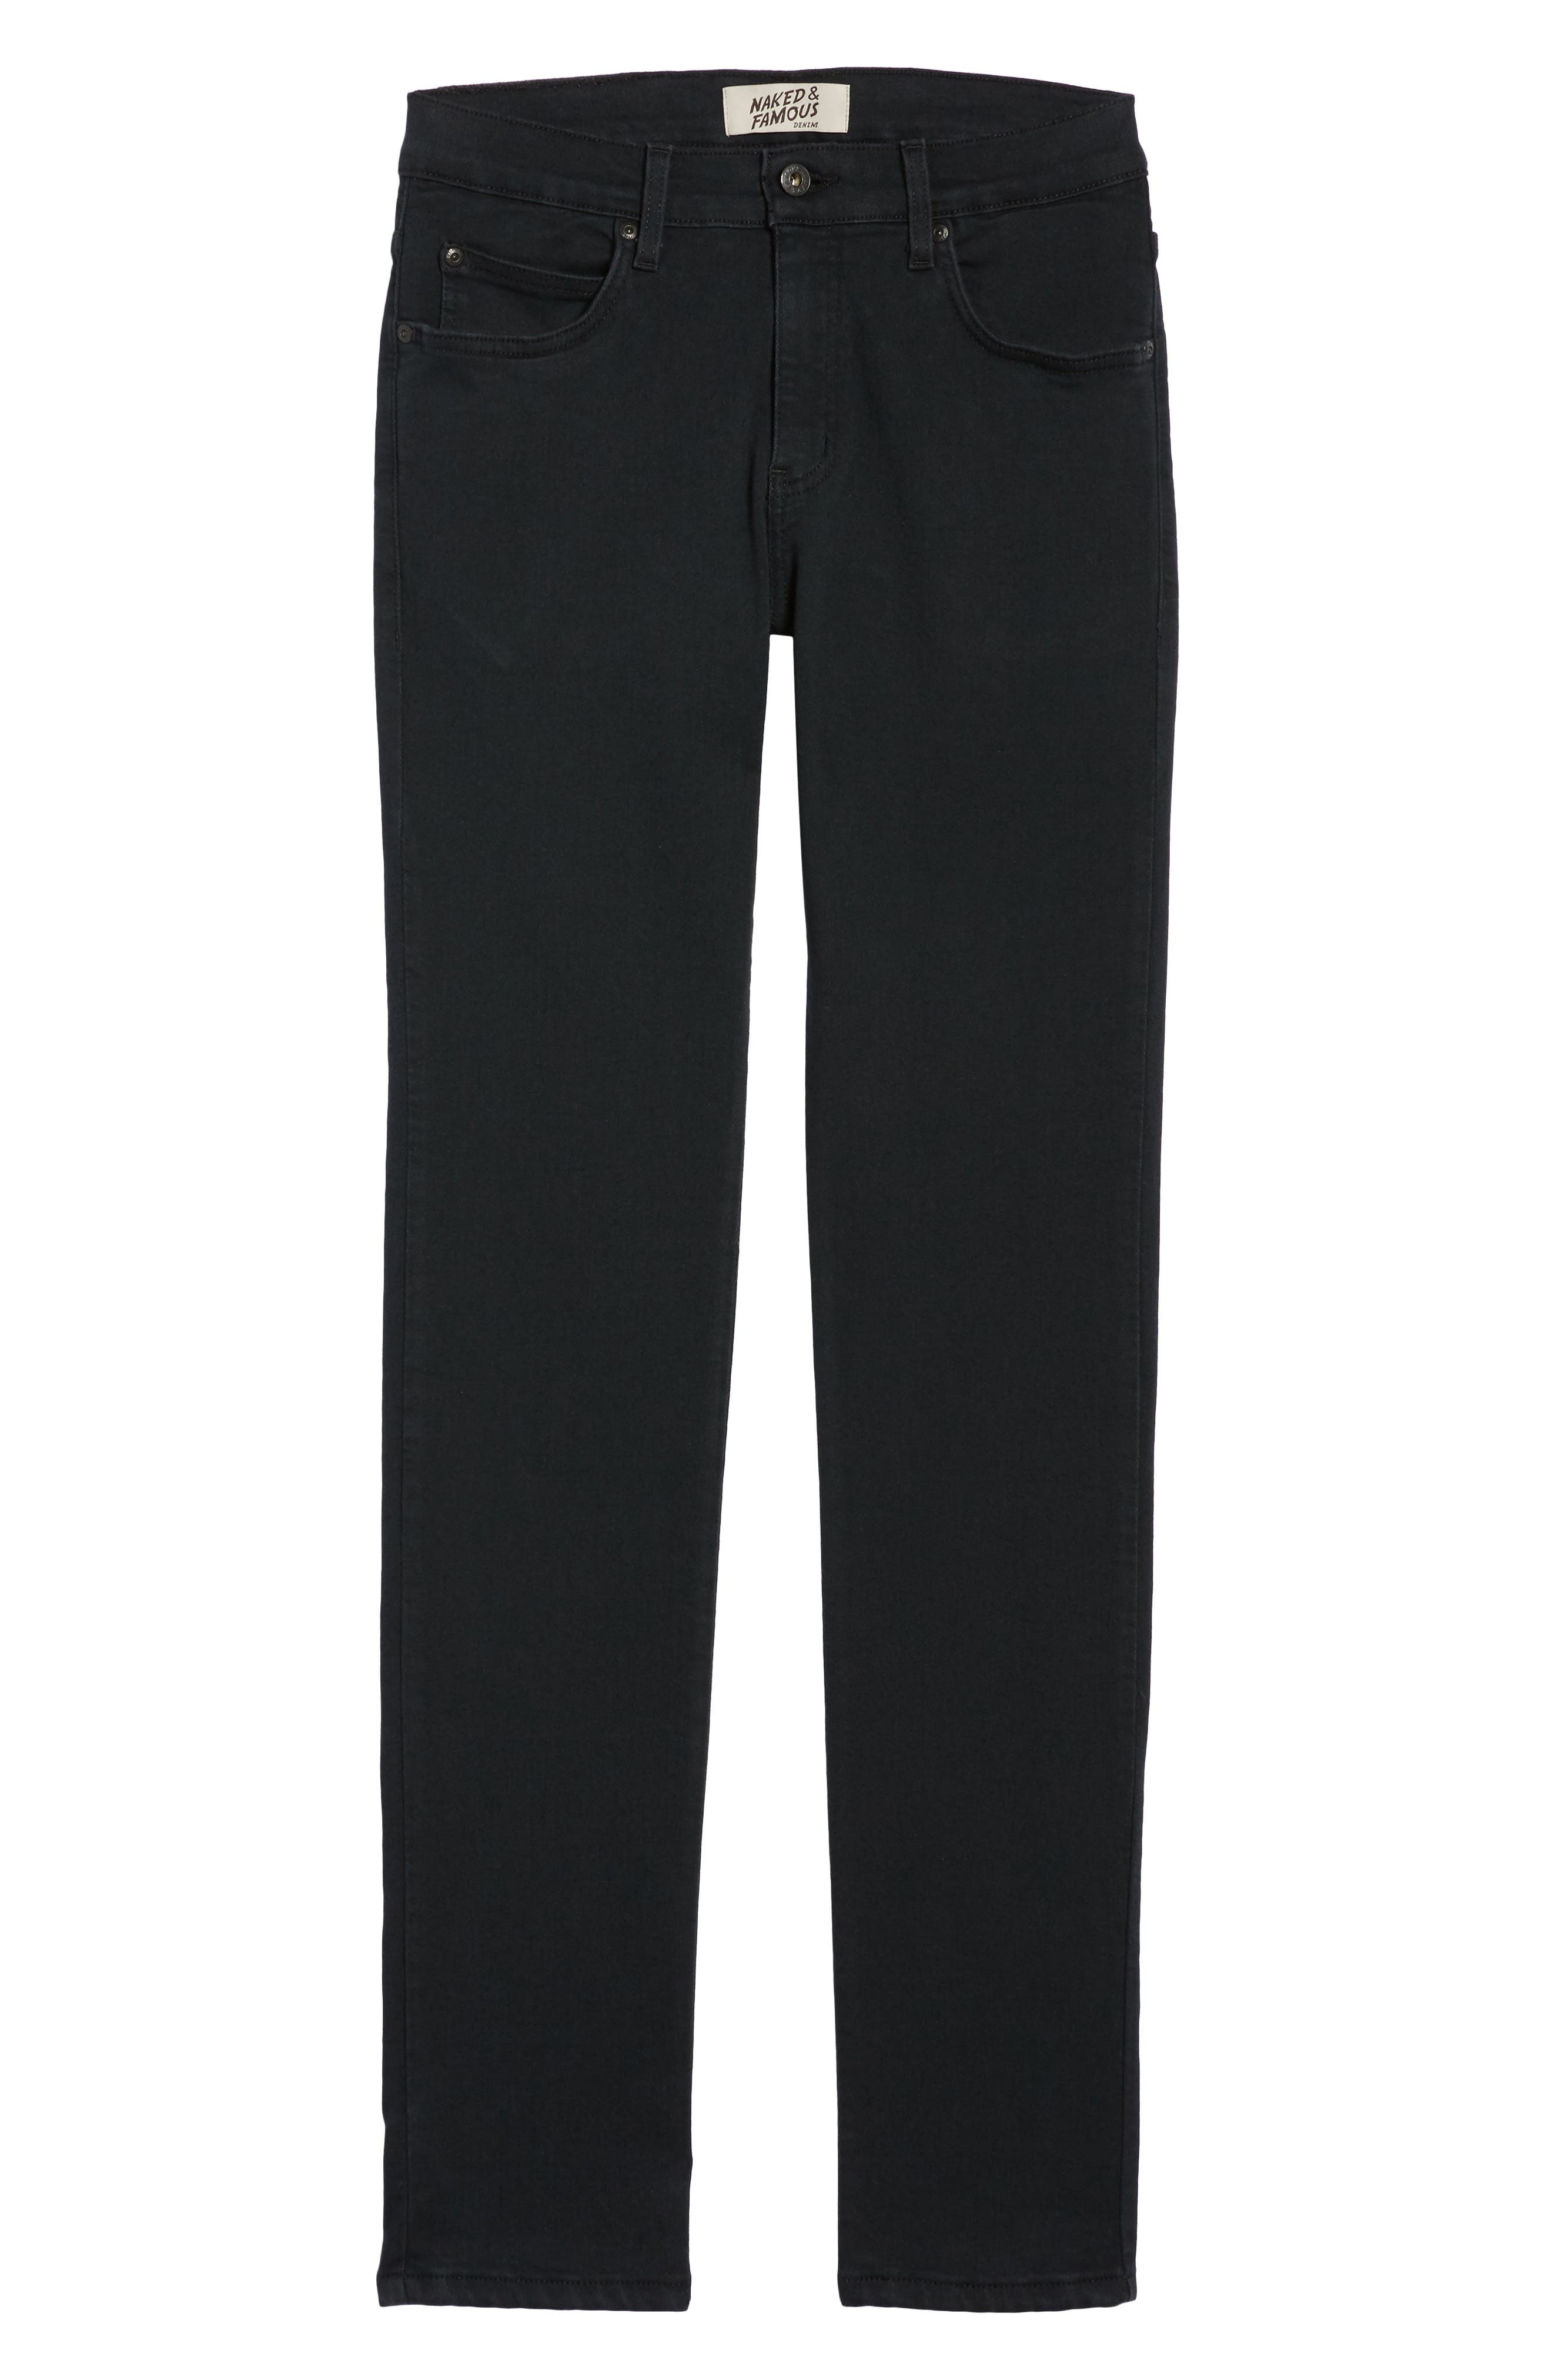 Super Skinny Guy Skinny Fit Jeans,                             Alternate thumbnail 6, color,                             Black